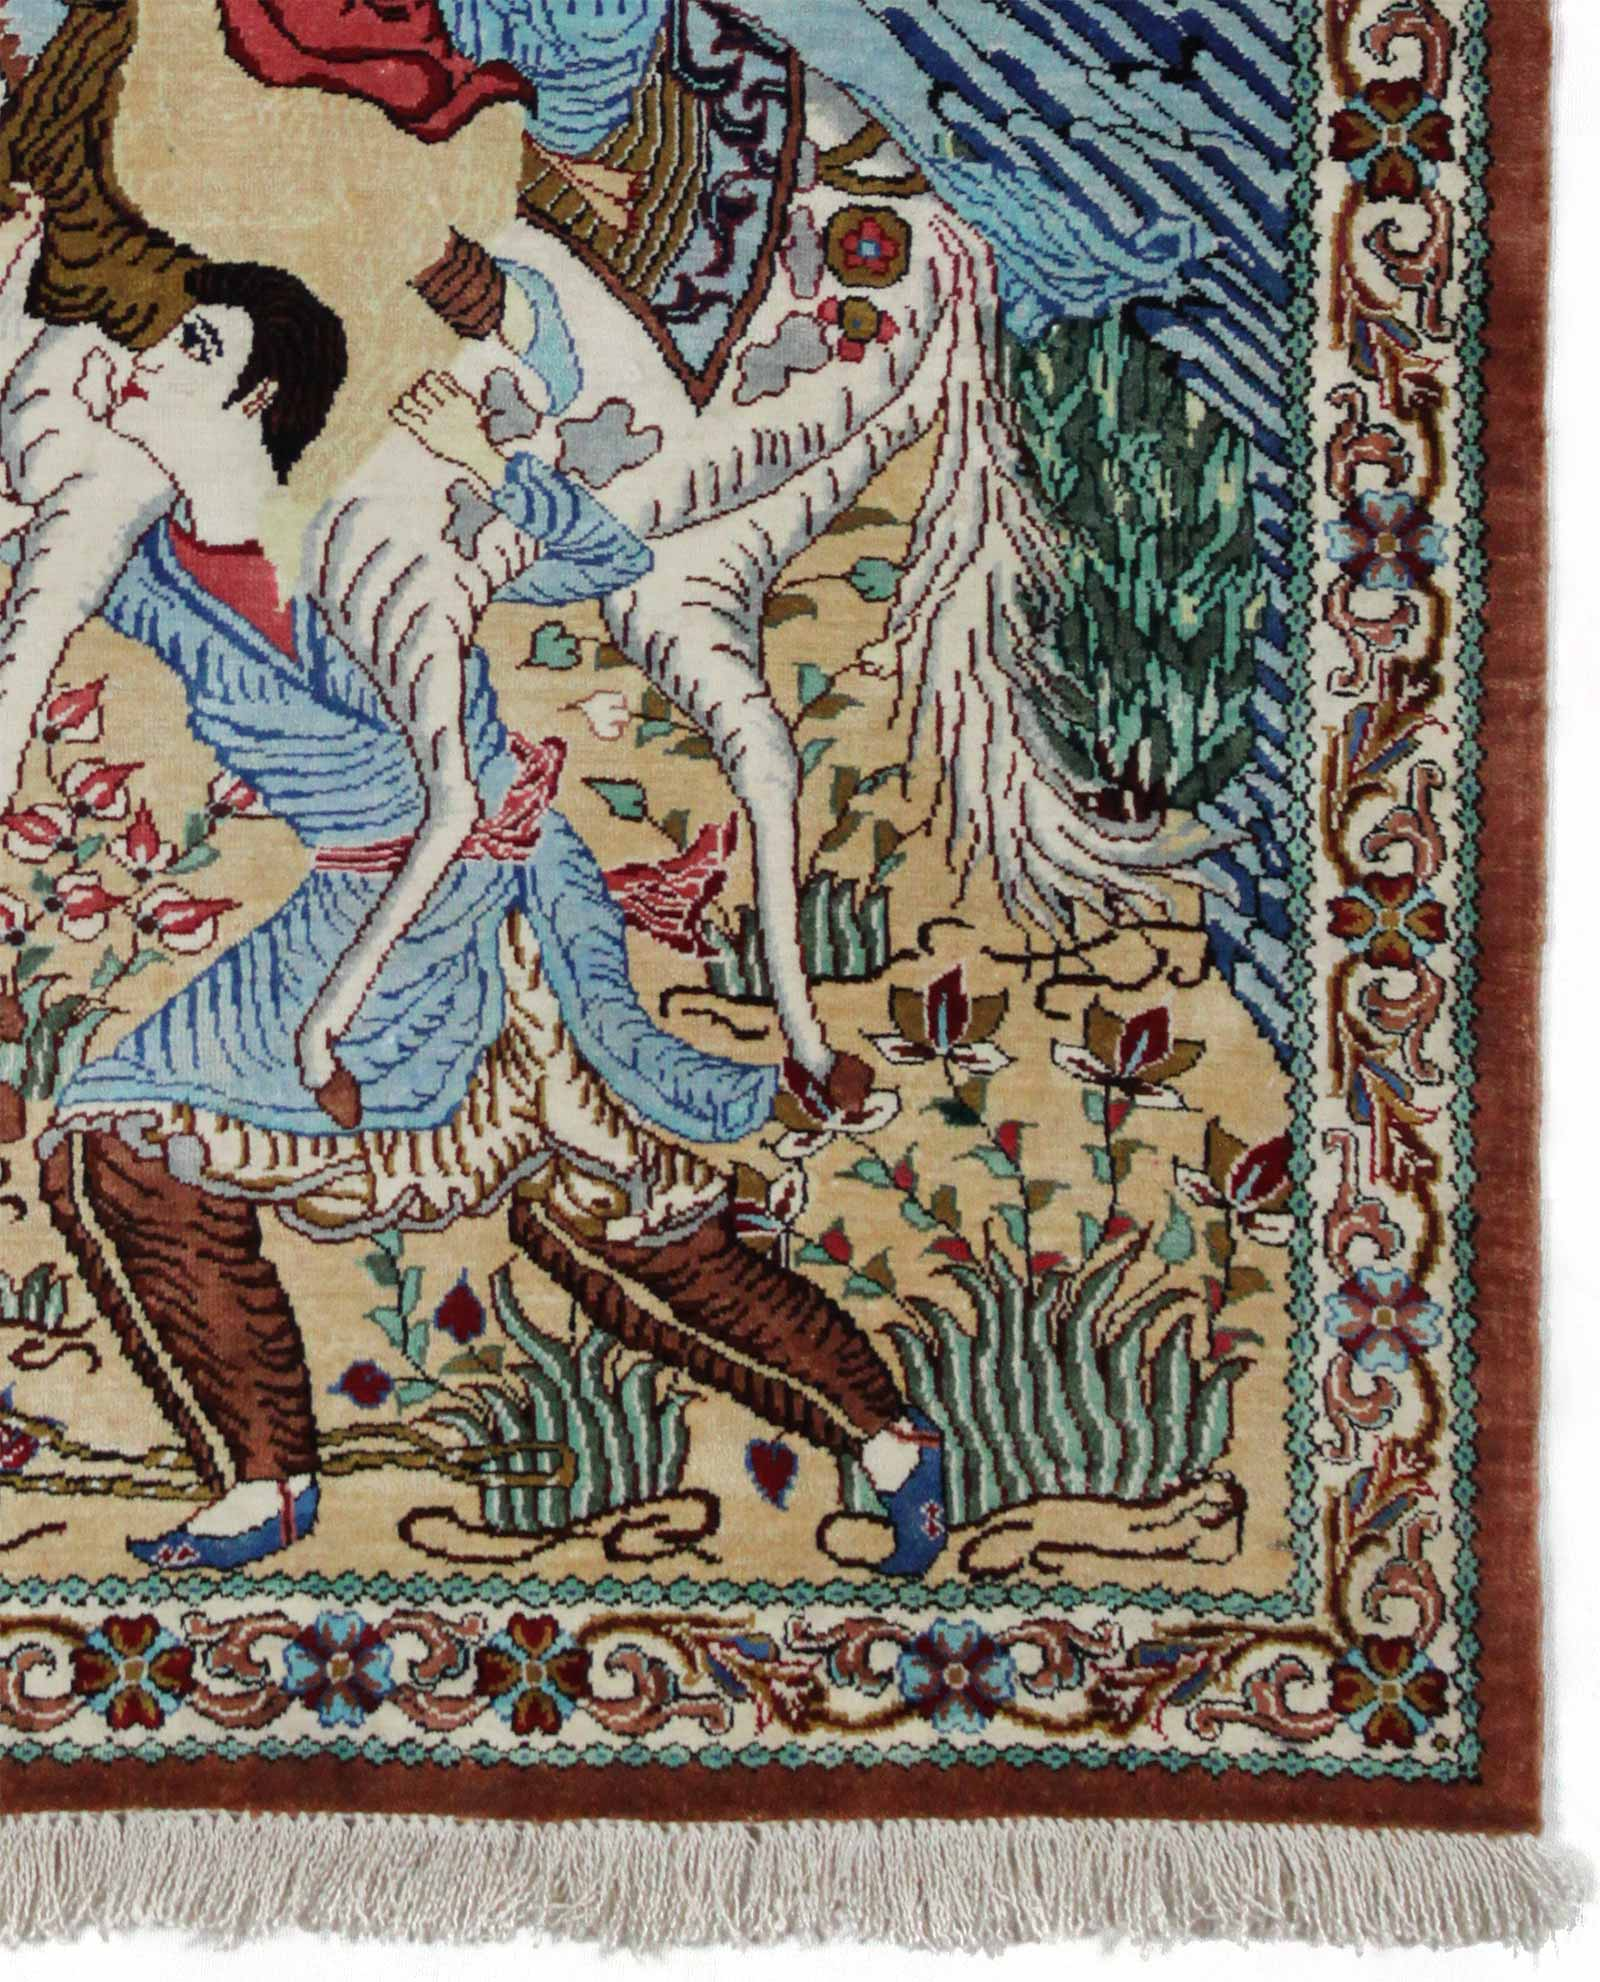 tapis persan ghom soie 9386 iranian carpet. Black Bedroom Furniture Sets. Home Design Ideas